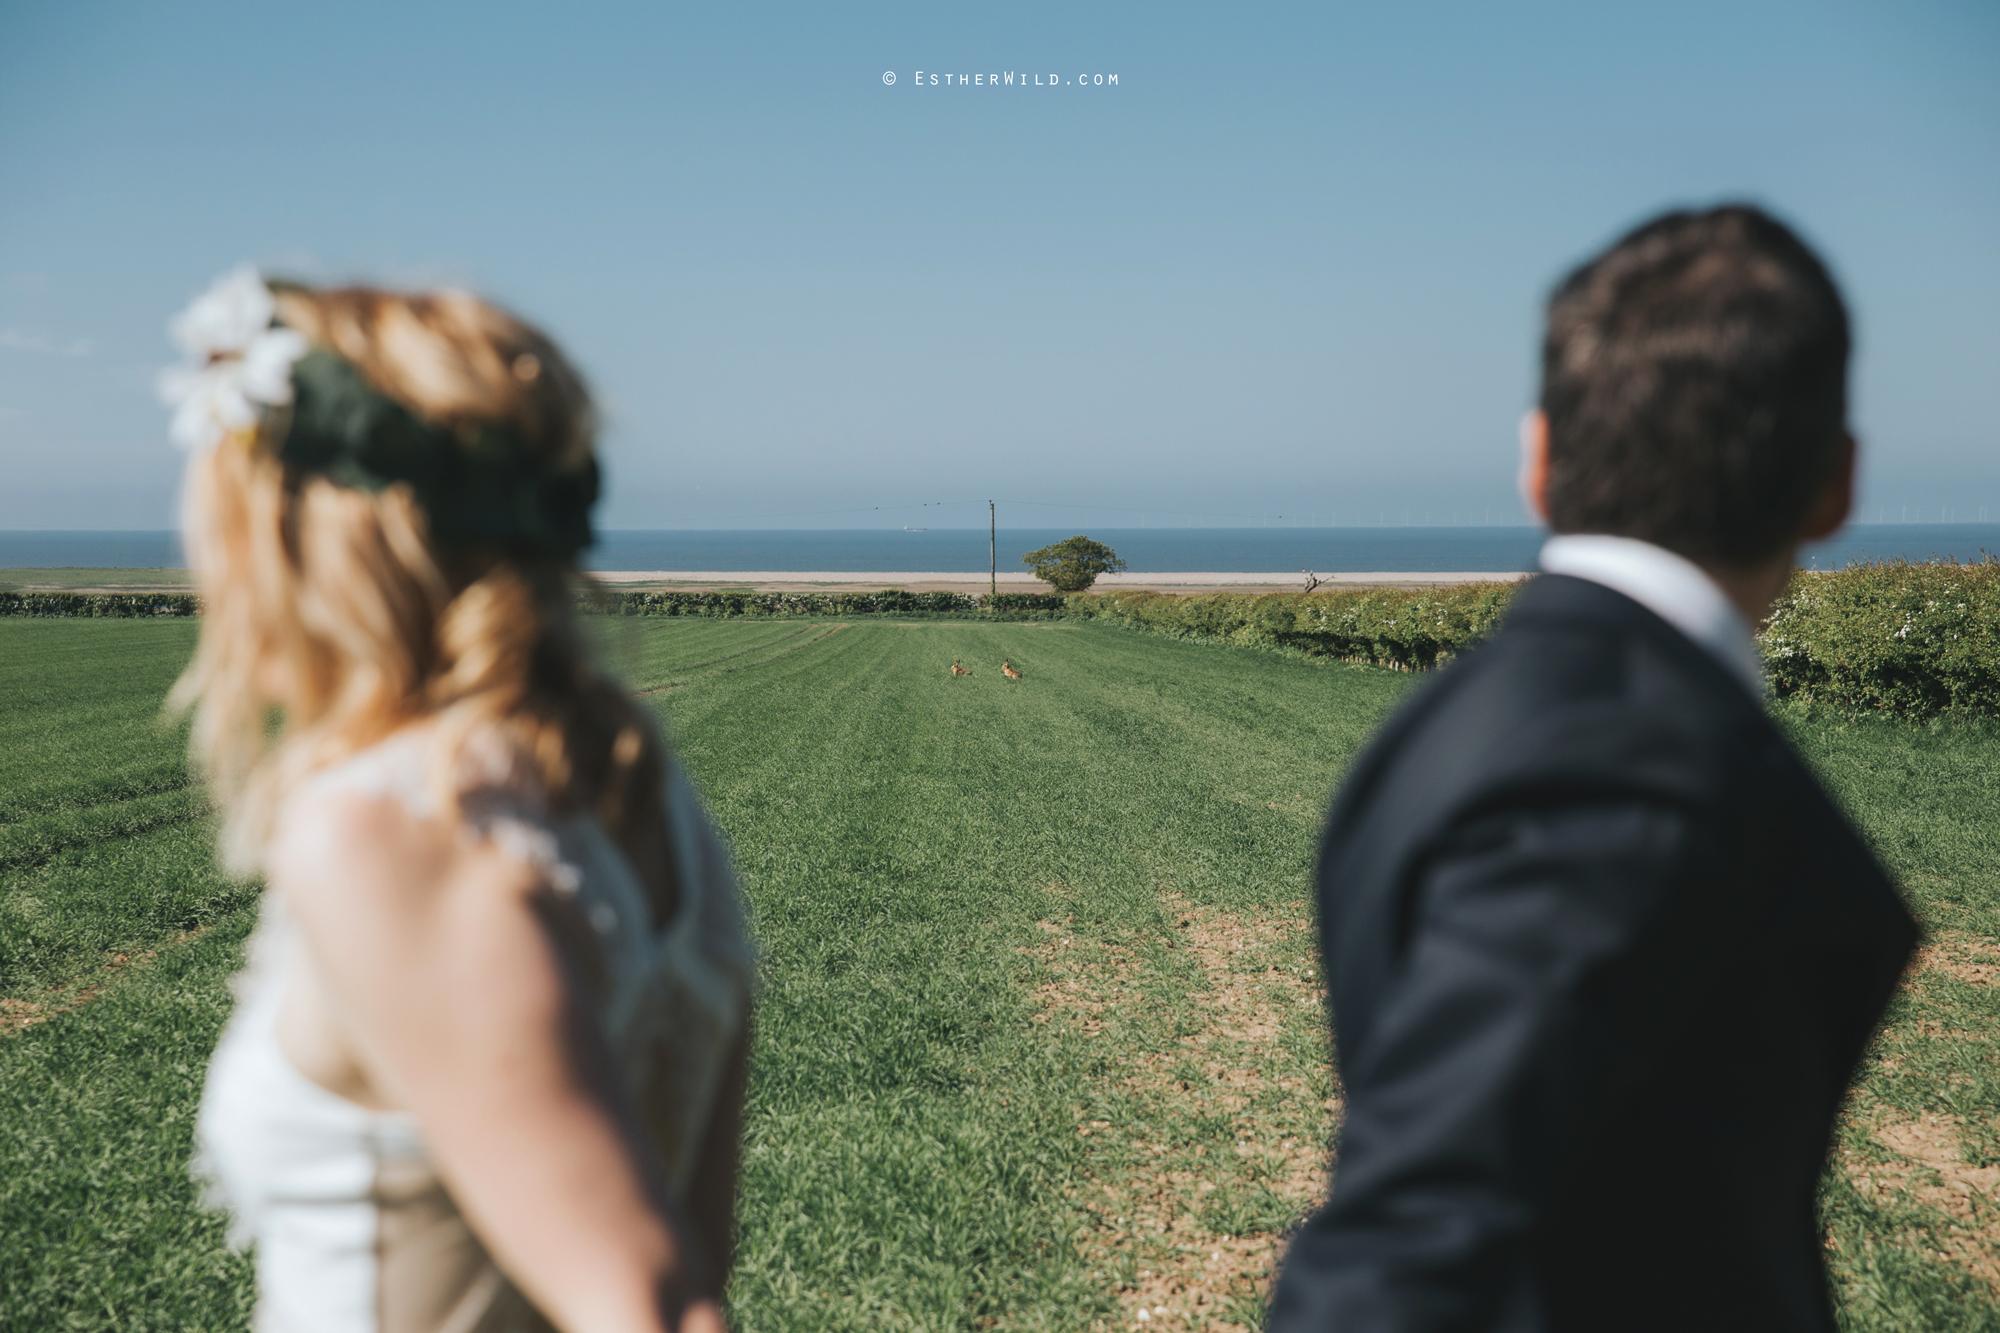 IMG_1475Cley_Barn_Drift_Norfolk_Coast_Wedding_Copyright_Esther_Wild_Photographer_.jpg